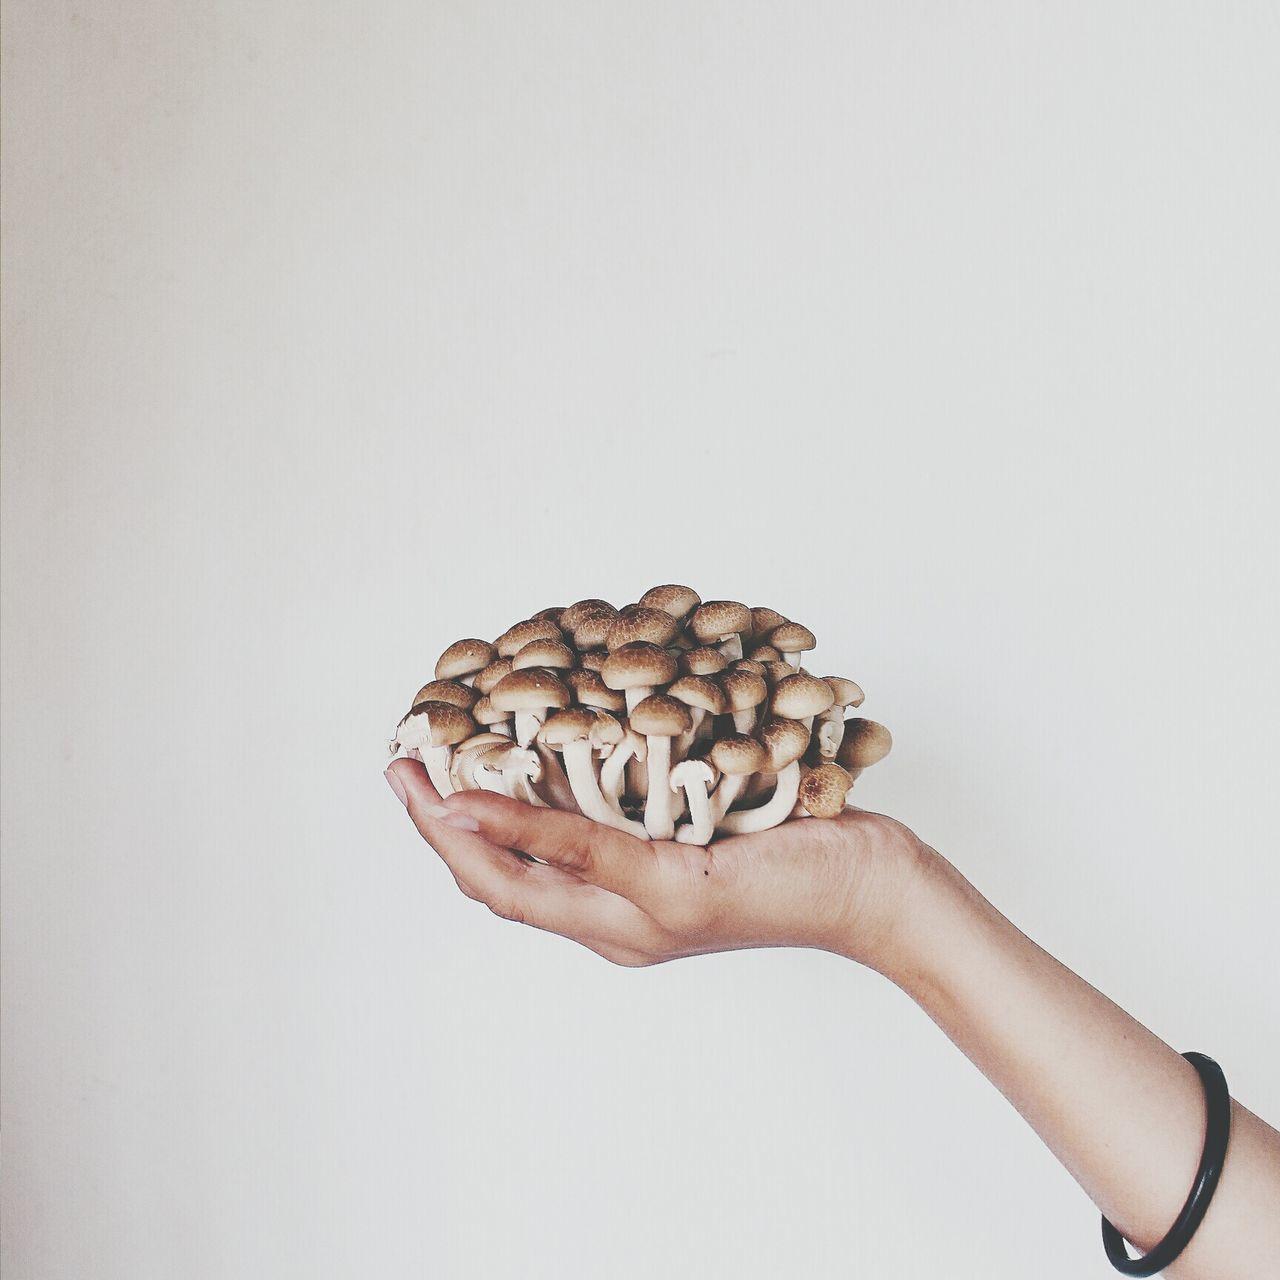 Studio Shot Of Mushroom In Human Hand